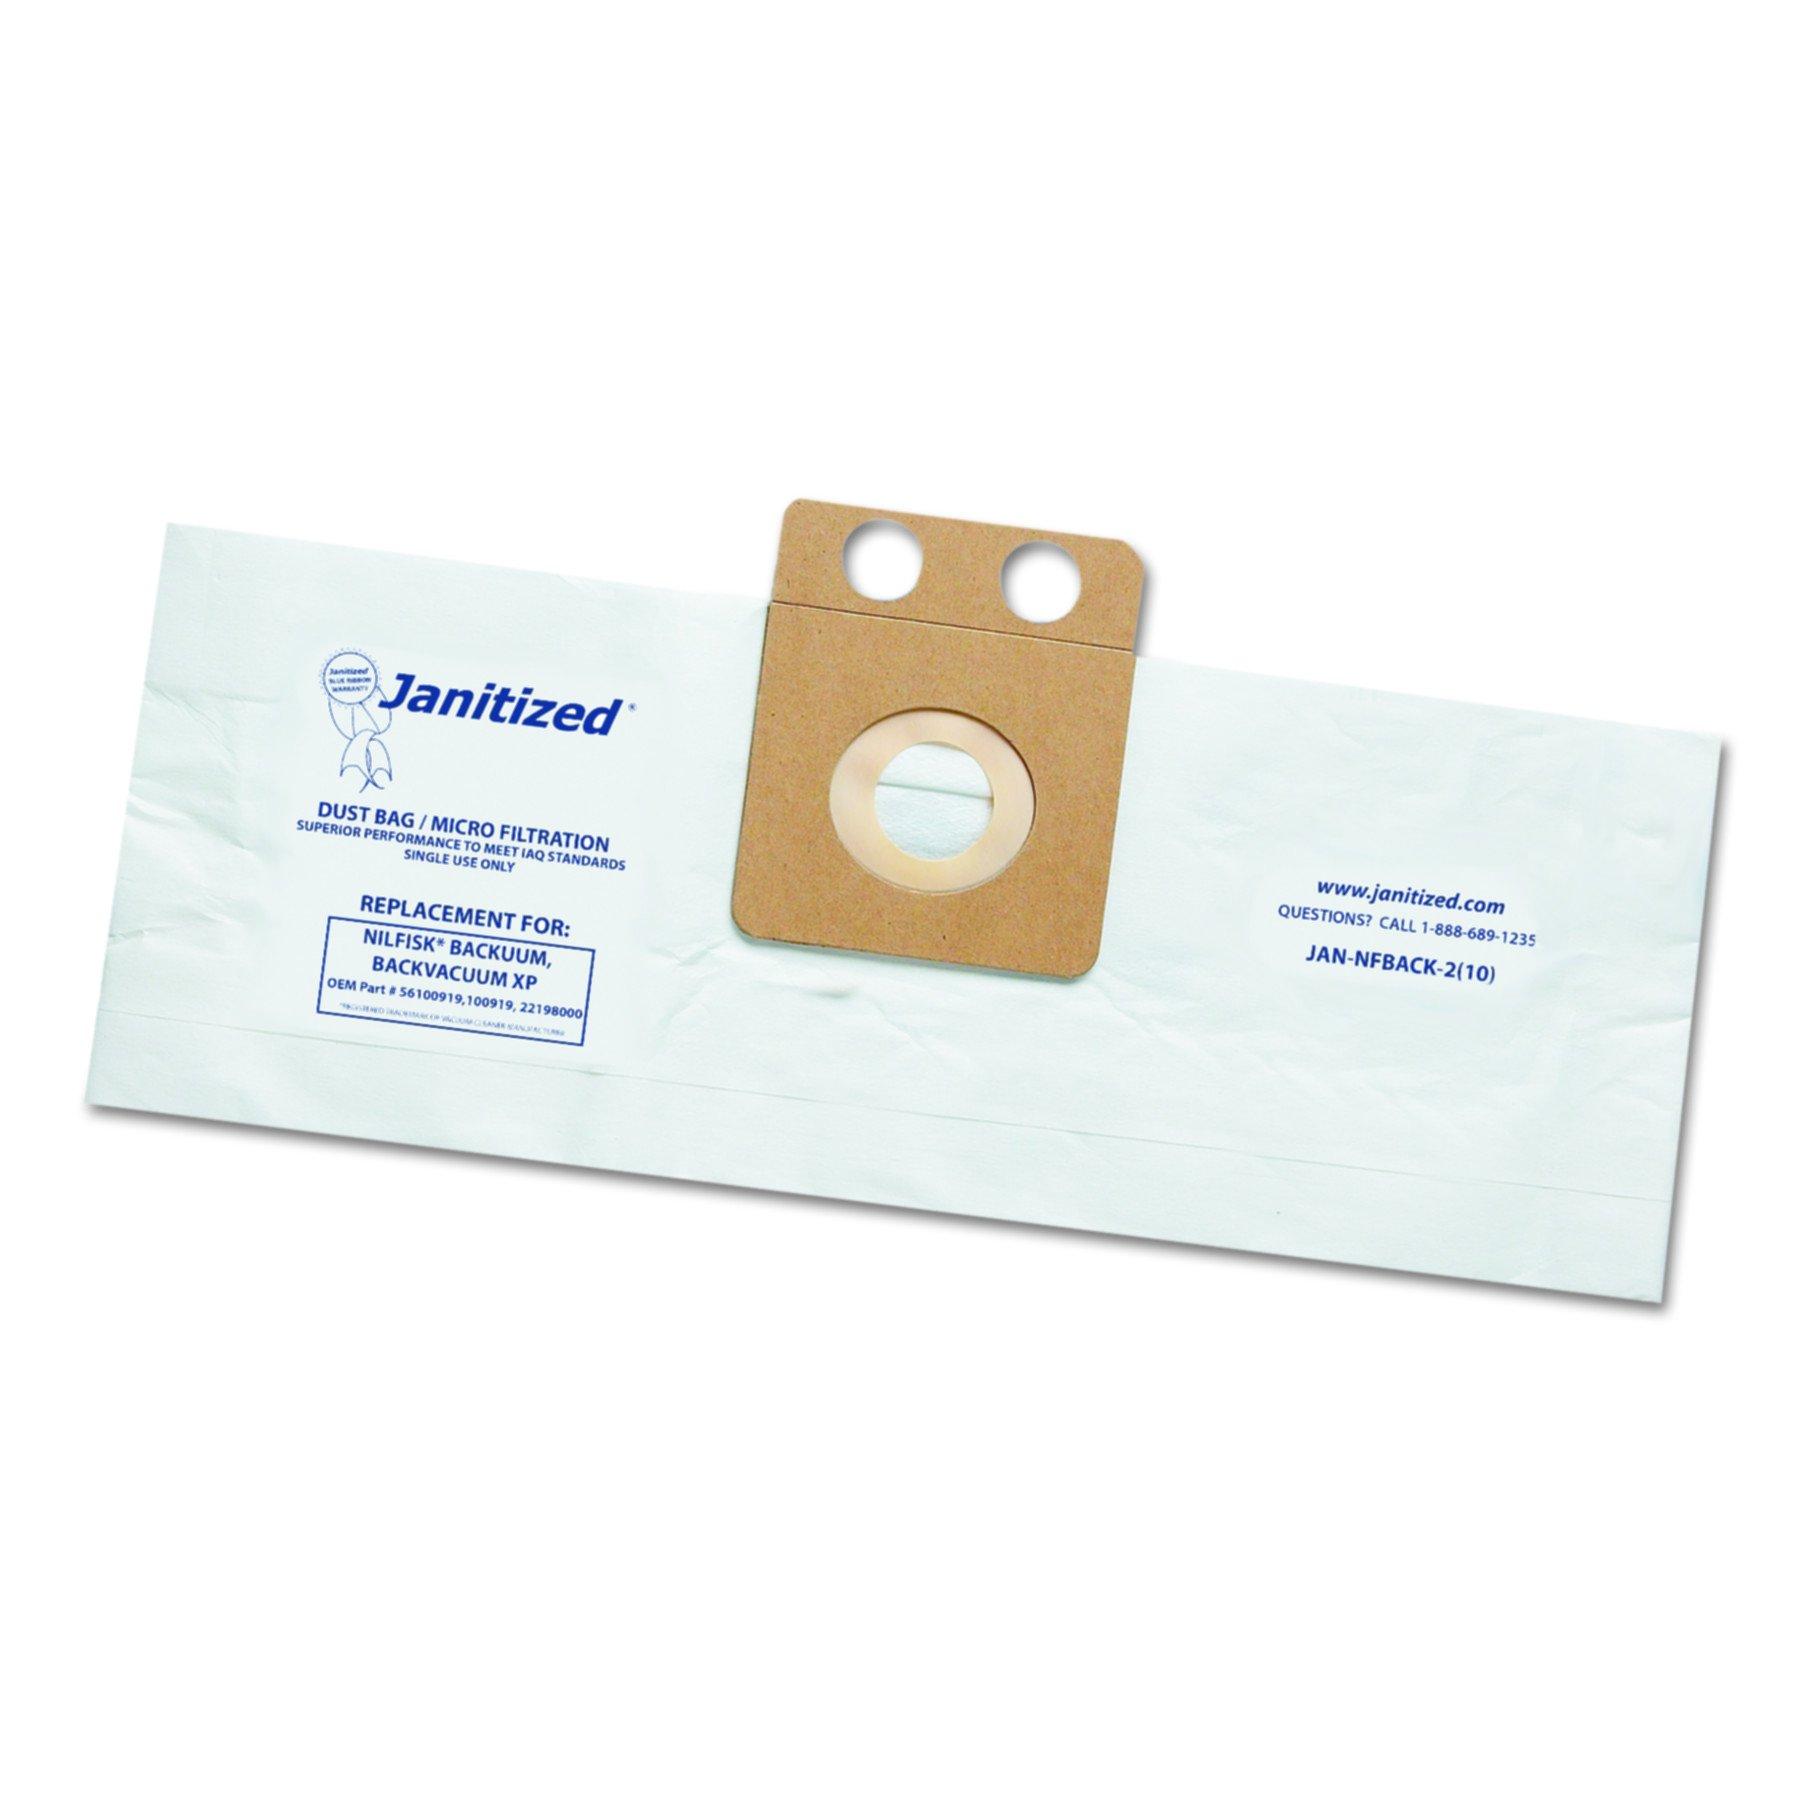 Janitized JANNFBACK2 Vacuum Filter Bags Designed to Fit Nilfisk Backuum Backpack XP (Case of 100)